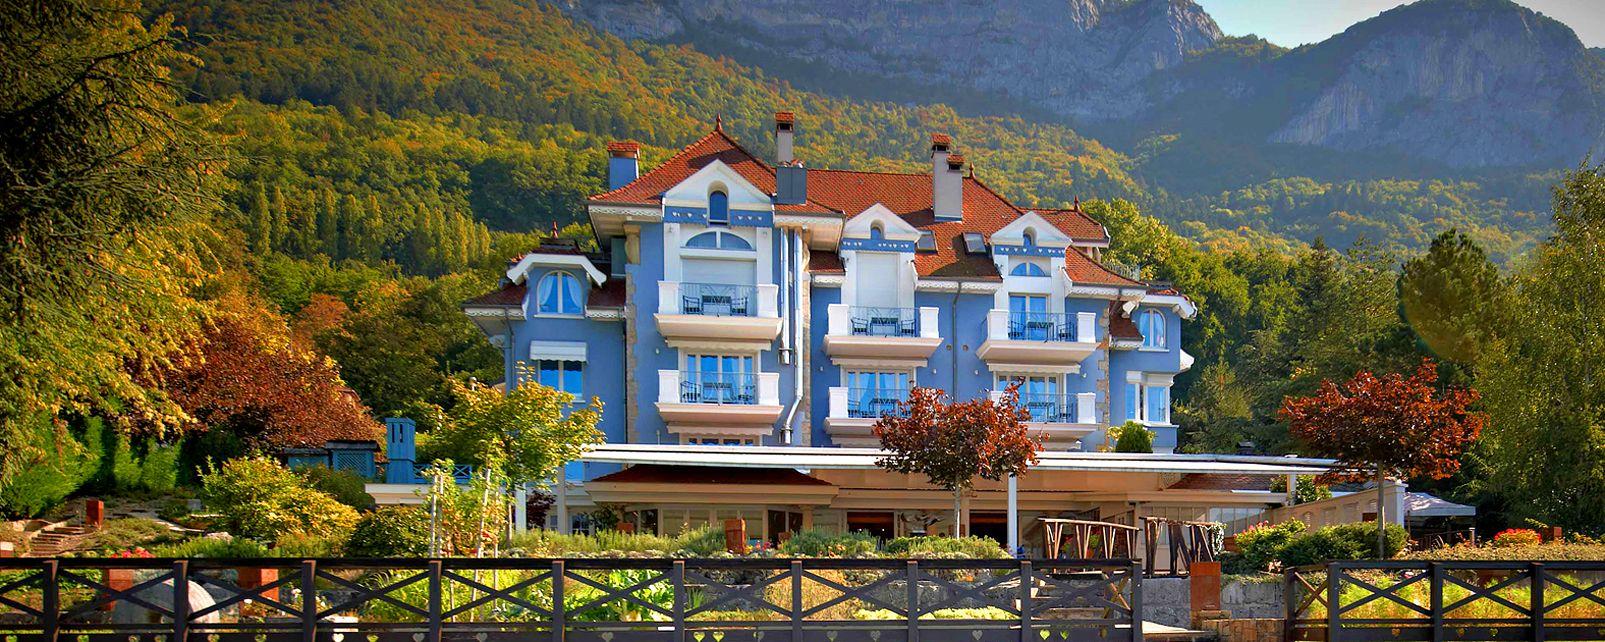 L'Auberge de l'Eridan , The new house of Marc Veyrat , France